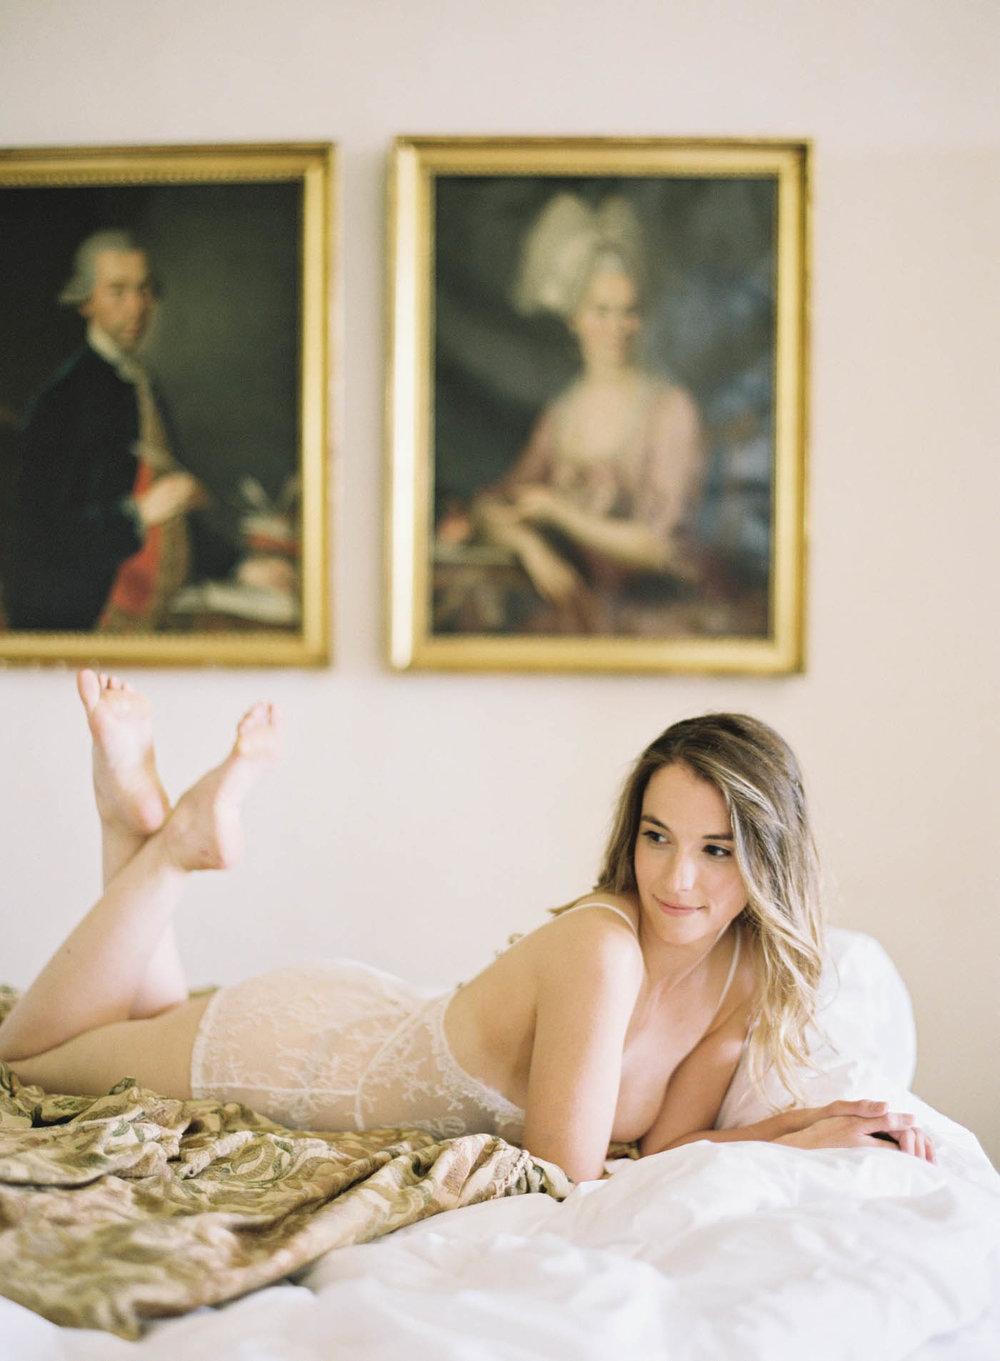 Italian_Villa_Boudoir-10-Jen_Huang-Elan_Jaffke_Boudoir-111-Jen_Huang-006877-R1-010.jpg